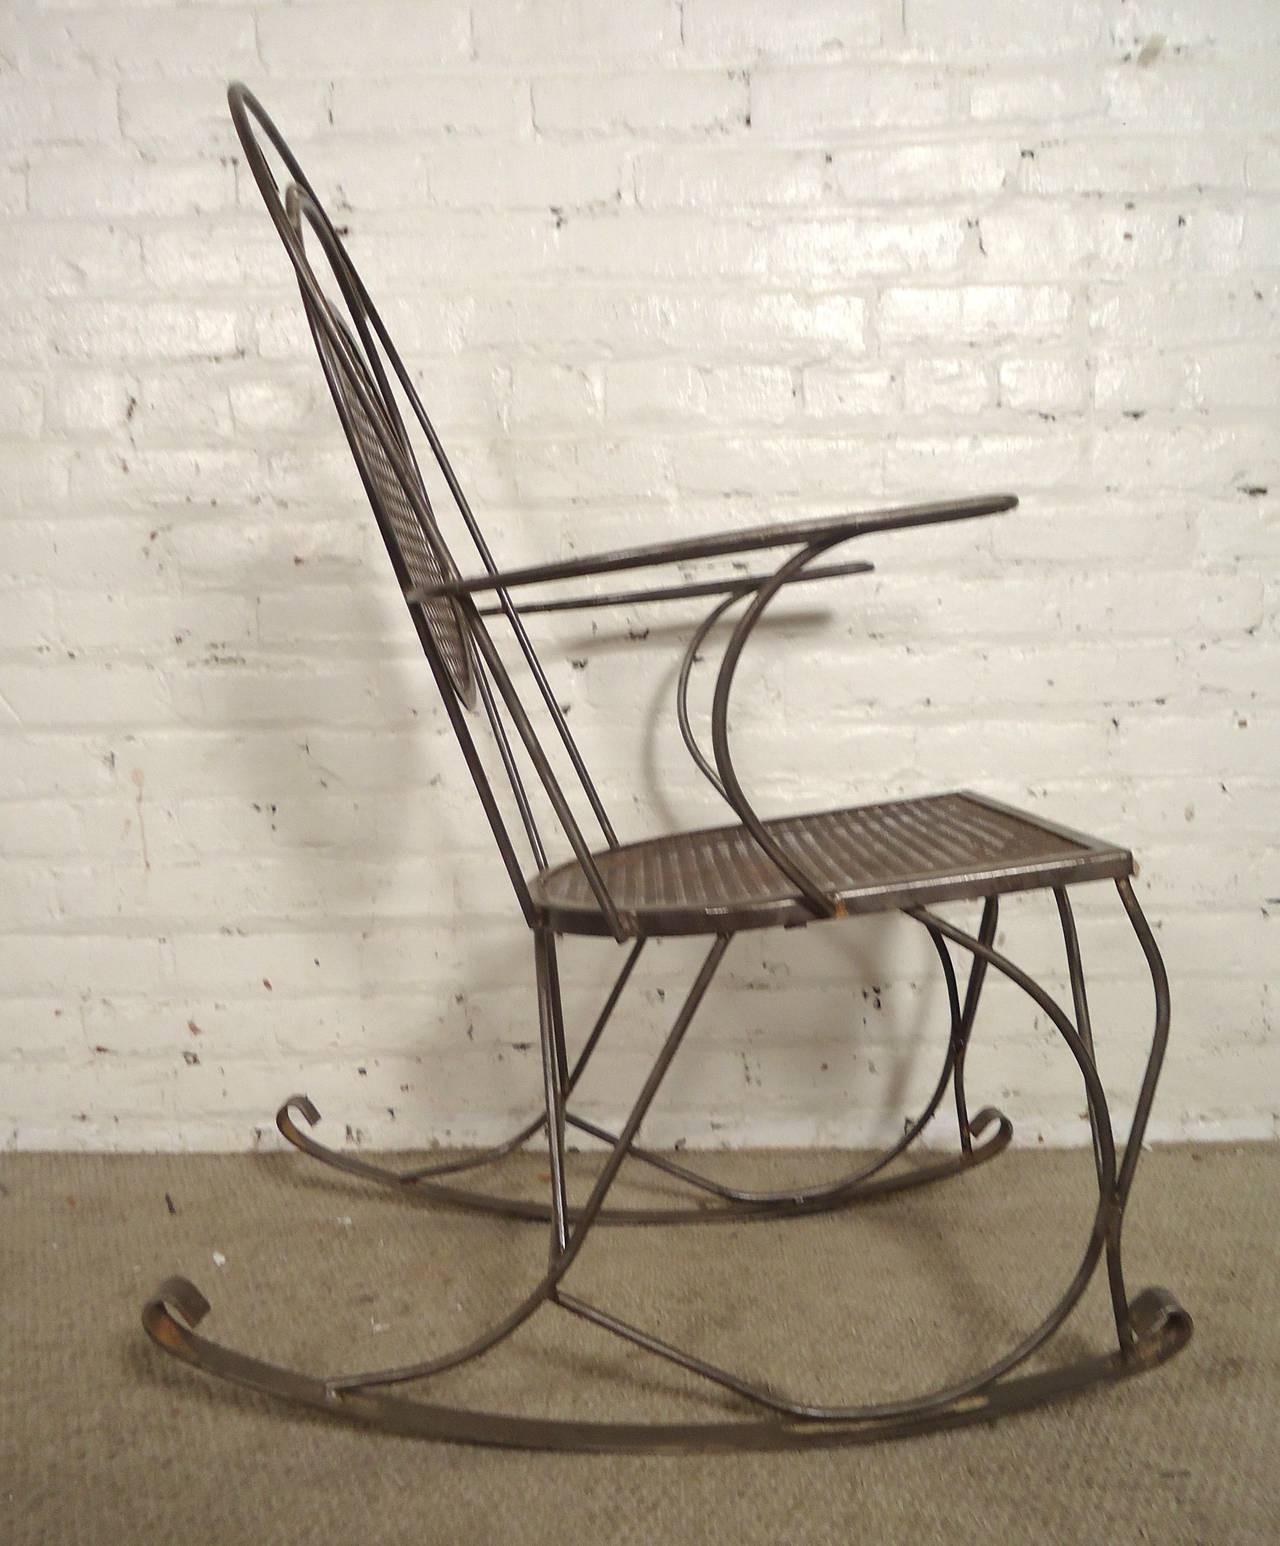 Vintage Outdoor Metal Rocking Chairs – Outdoor Designs With Vintage Outdoor Rocking Chairs (View 13 of 15)